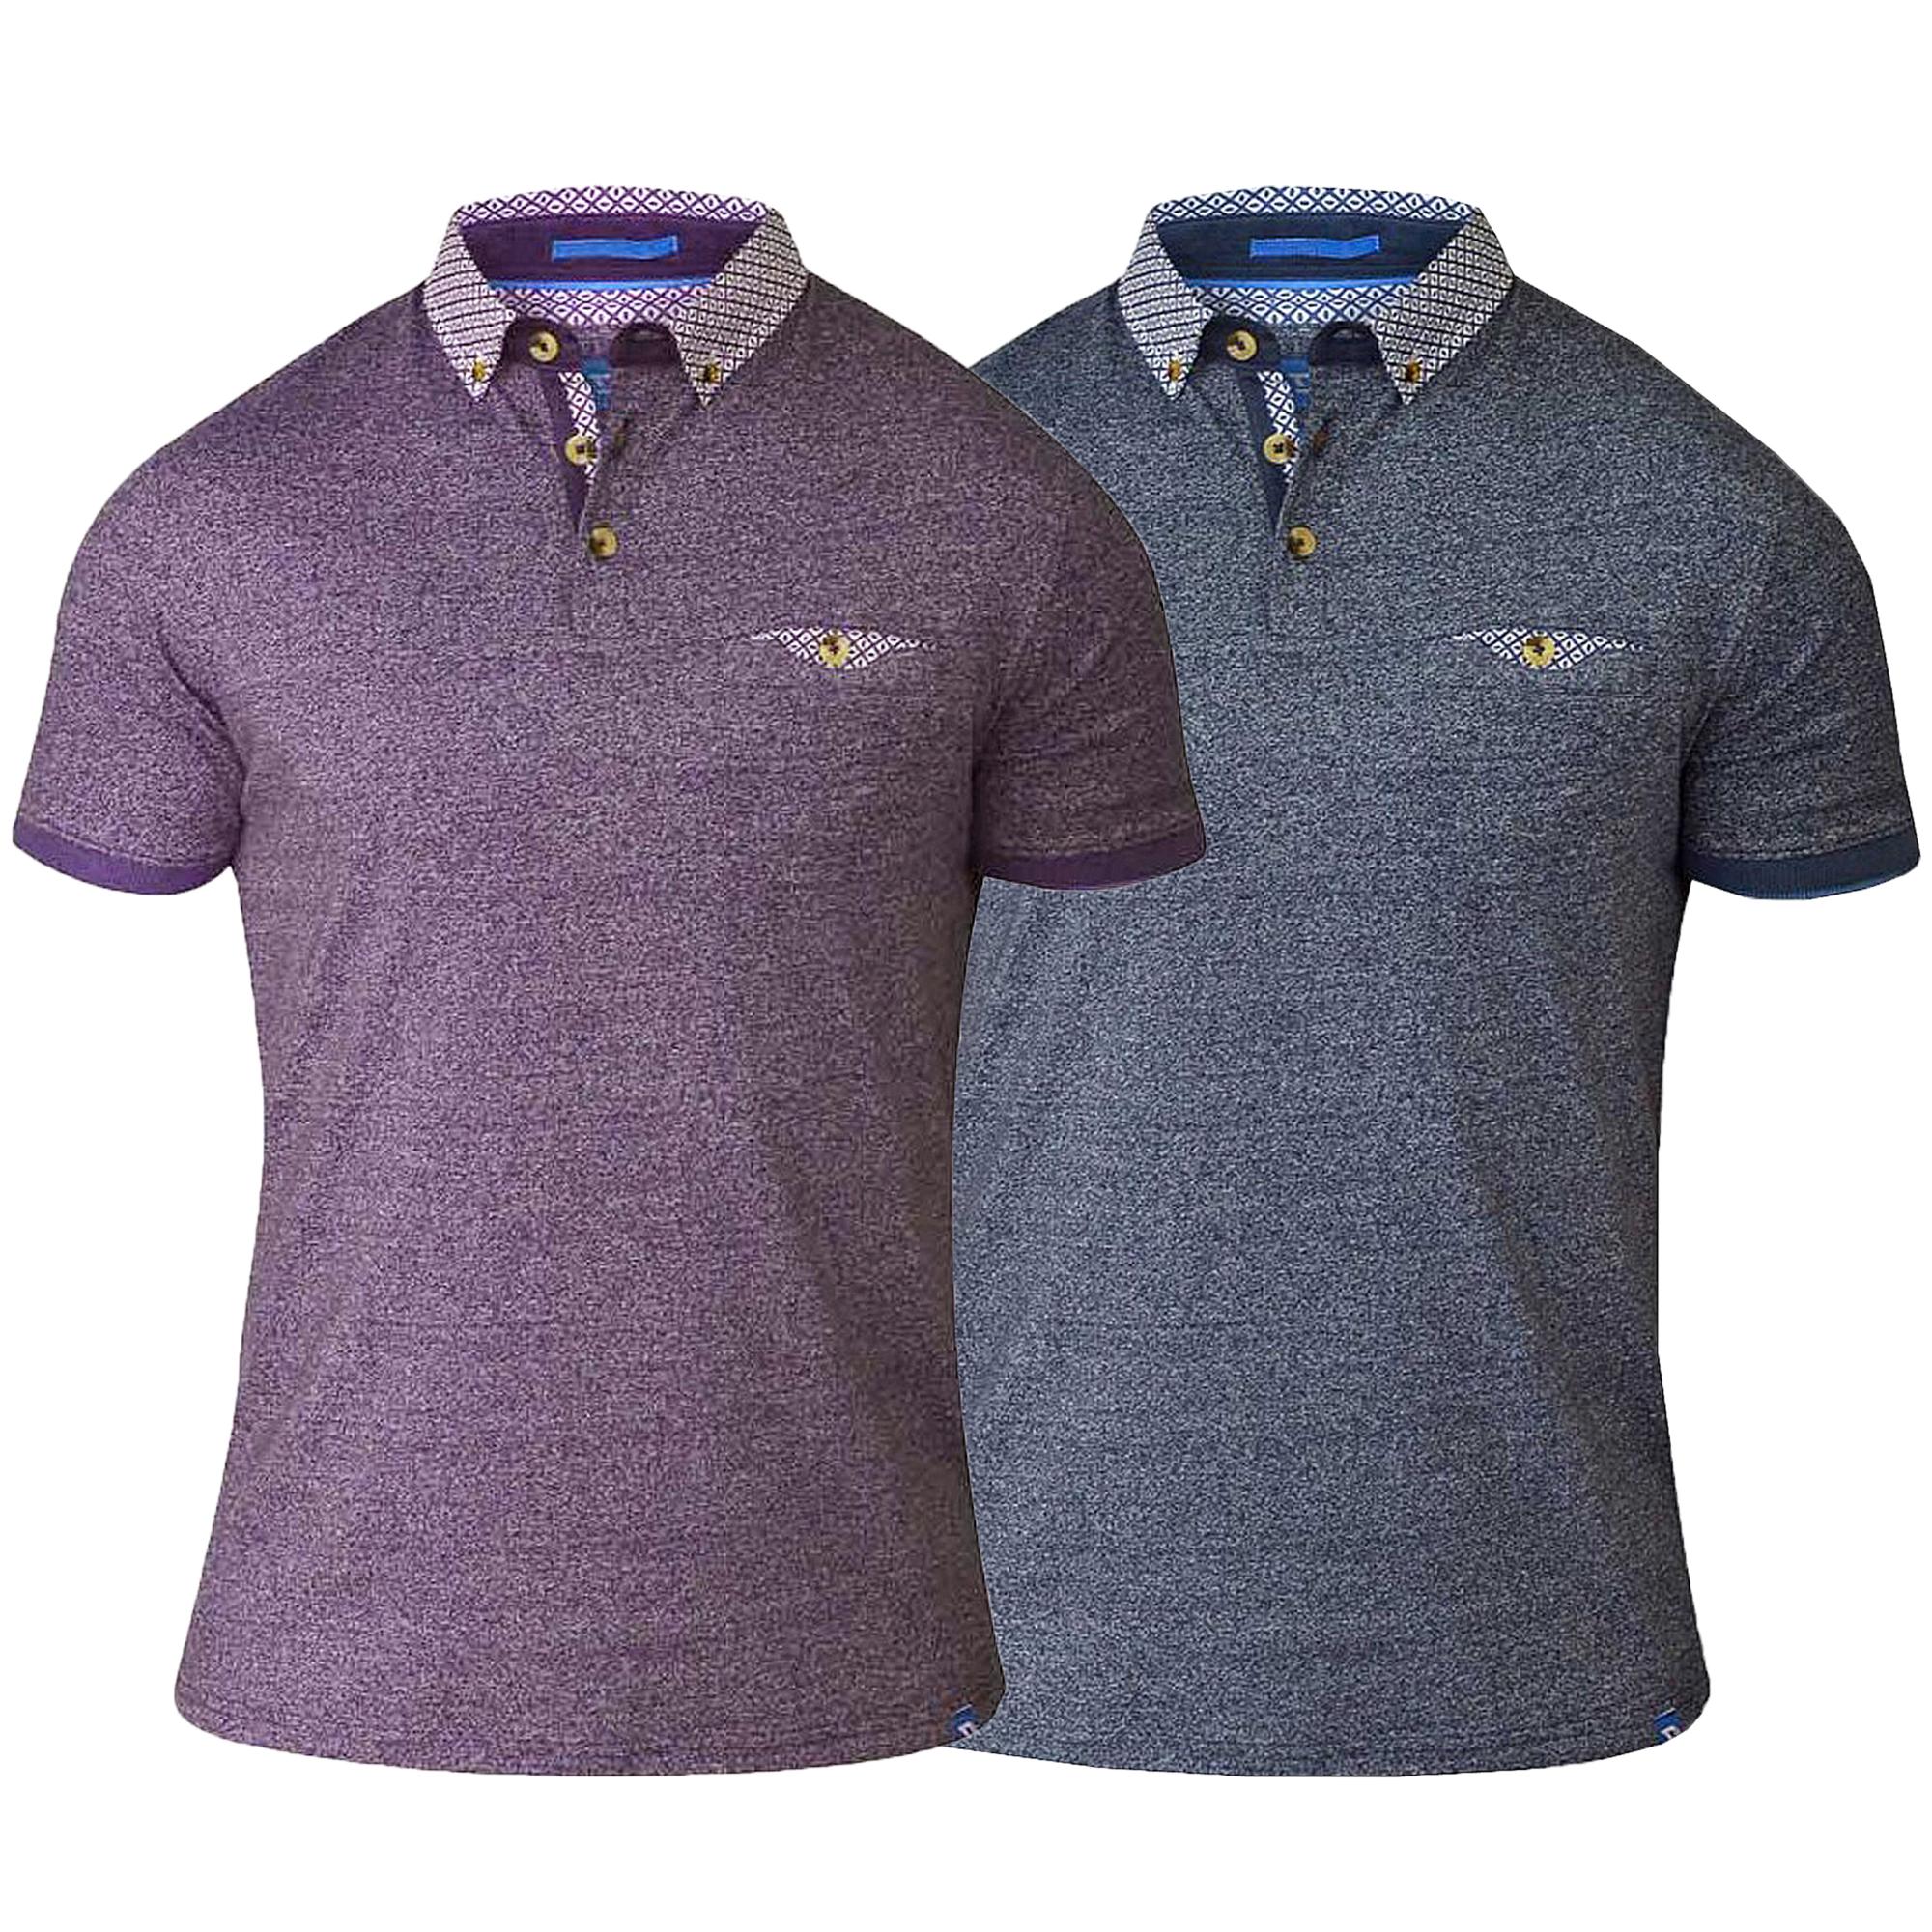 00681b87ad1 Mens Polo T Shirt D555 Duke Short Sleeved Pique Collared Big King ...